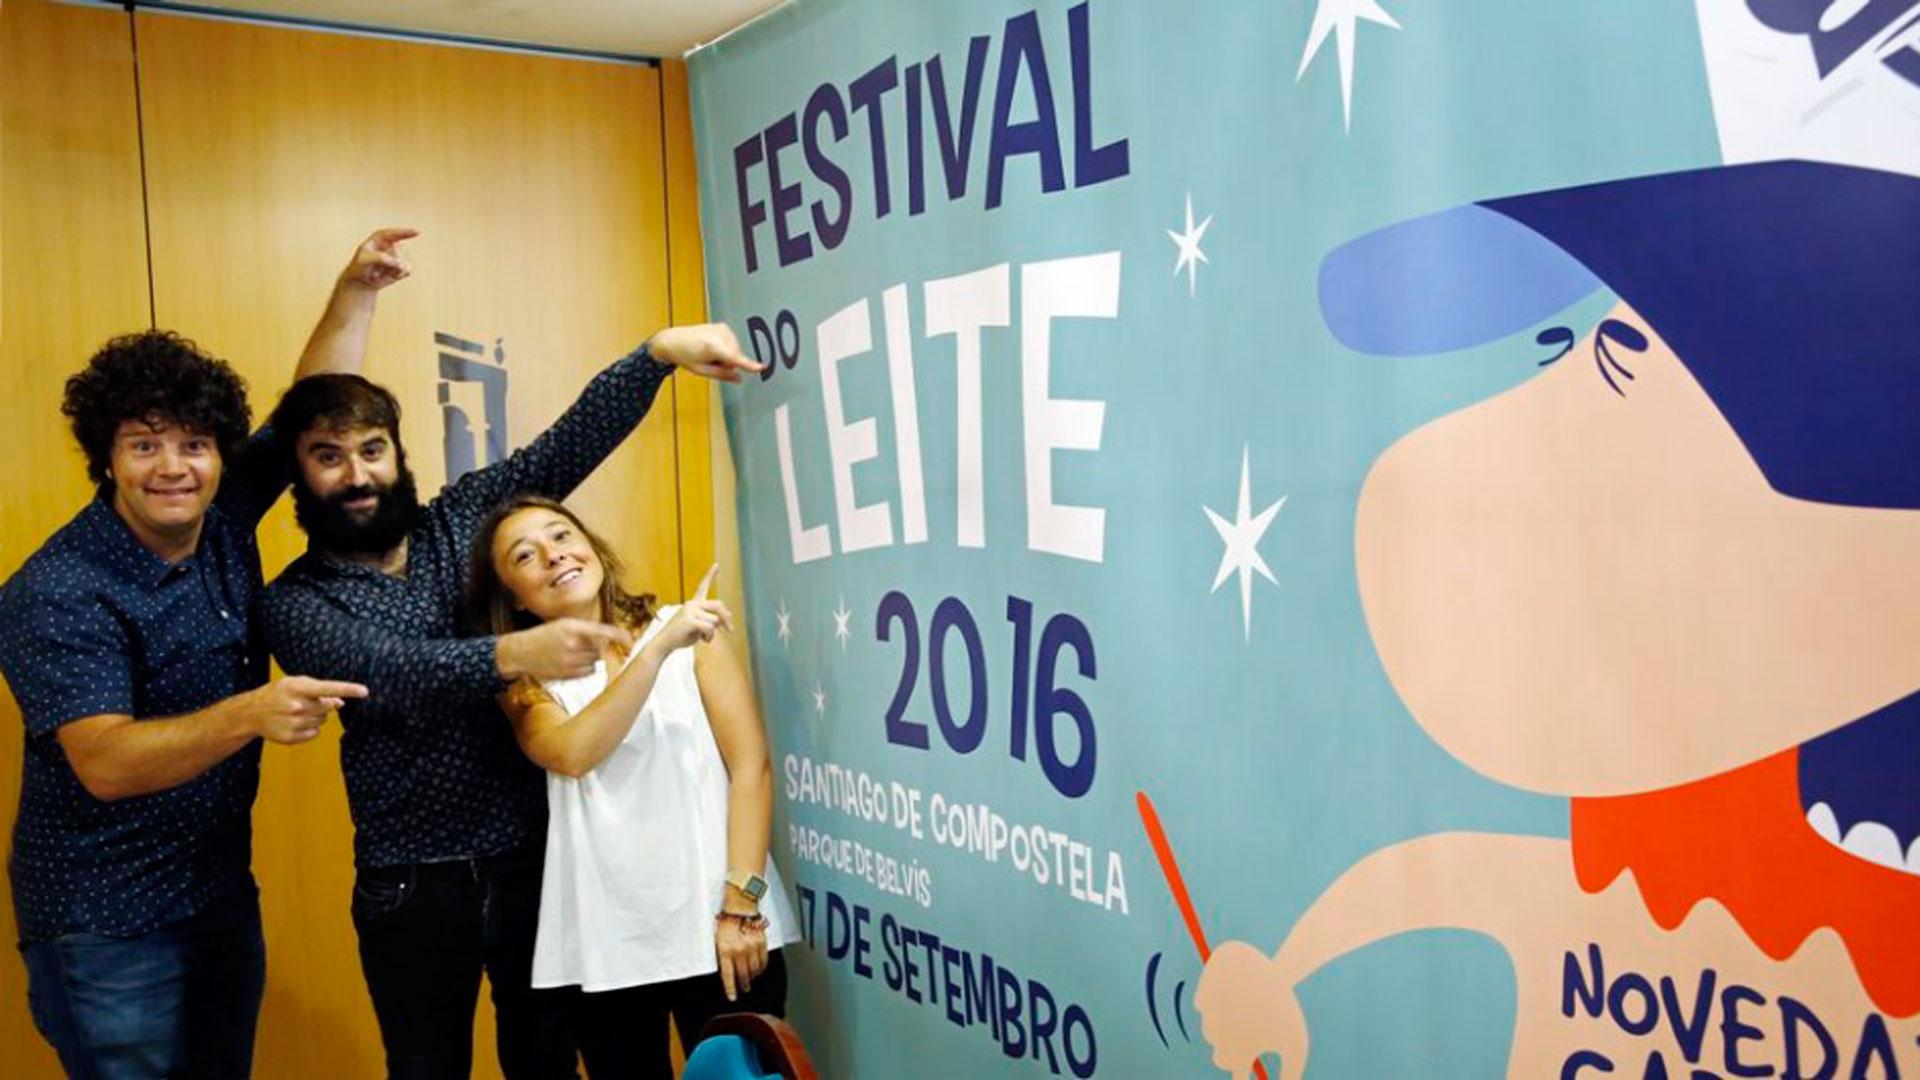 el-proximo-17-se-celebra-el-primer-festival-do-leite-1920